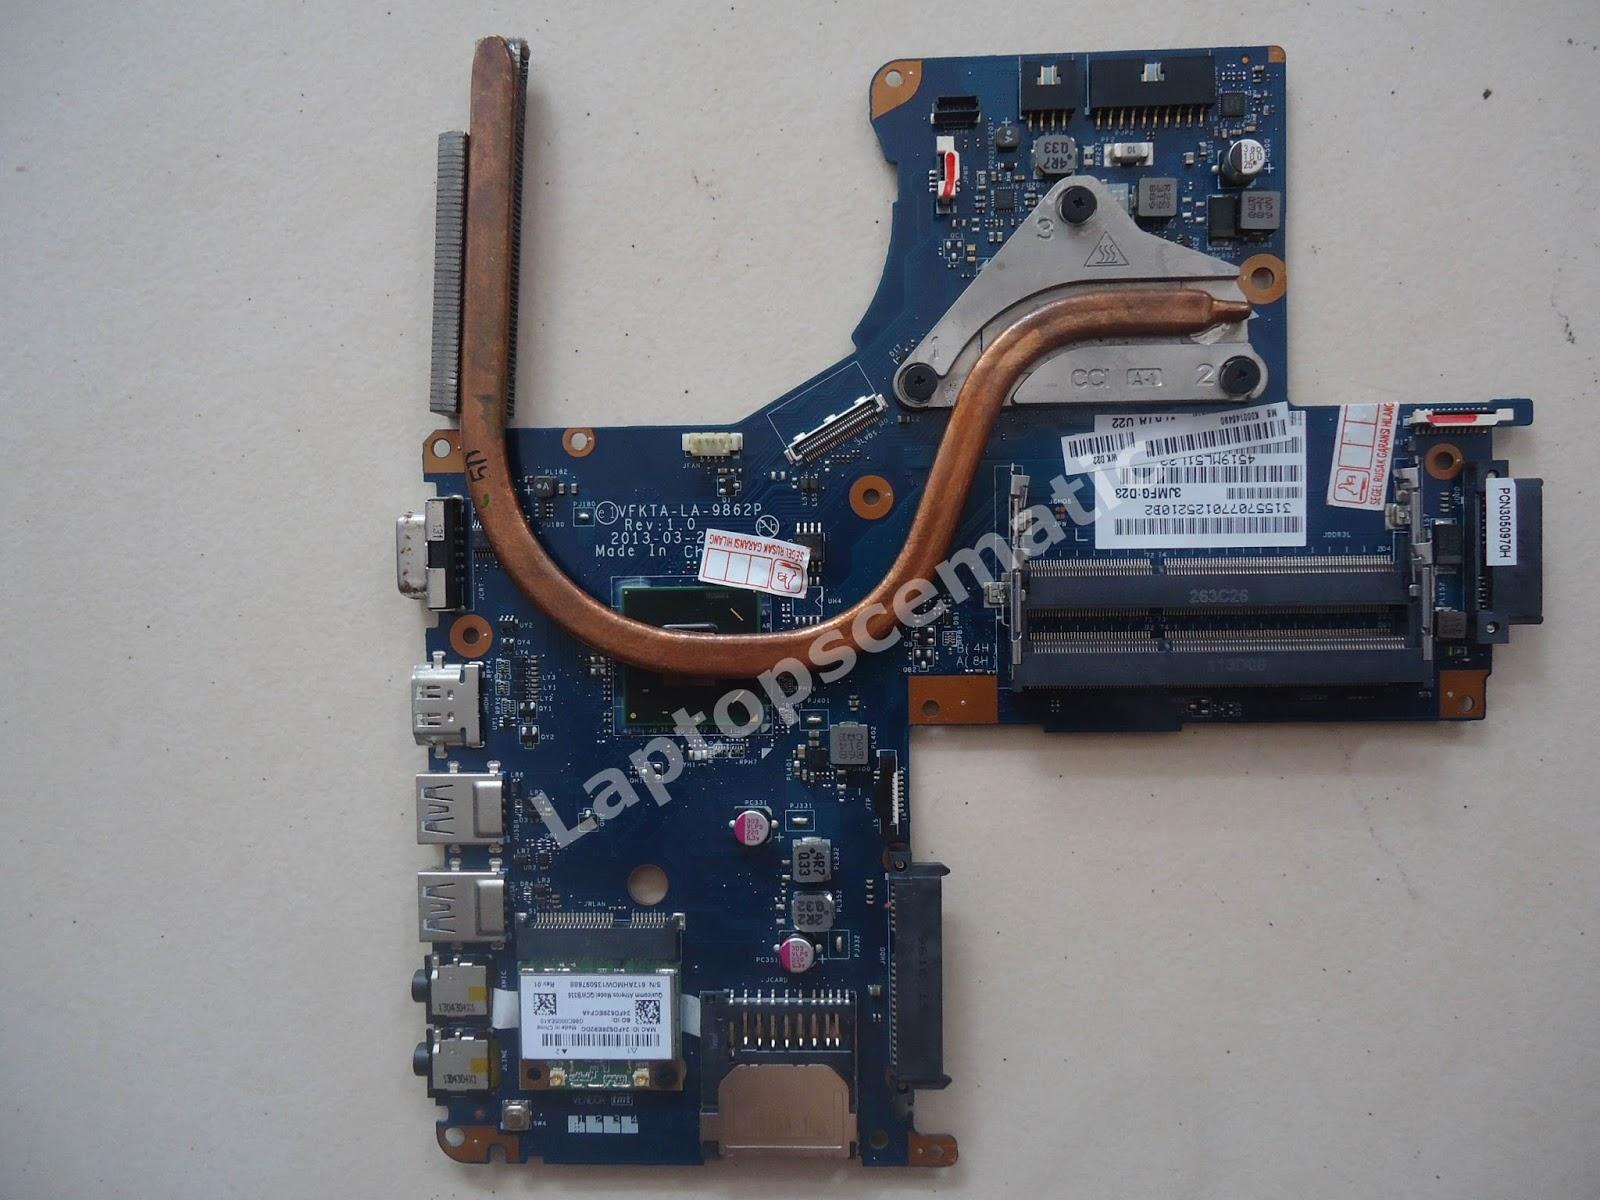 Motherboard Toshiba L40 Mainboard Code Vfkta